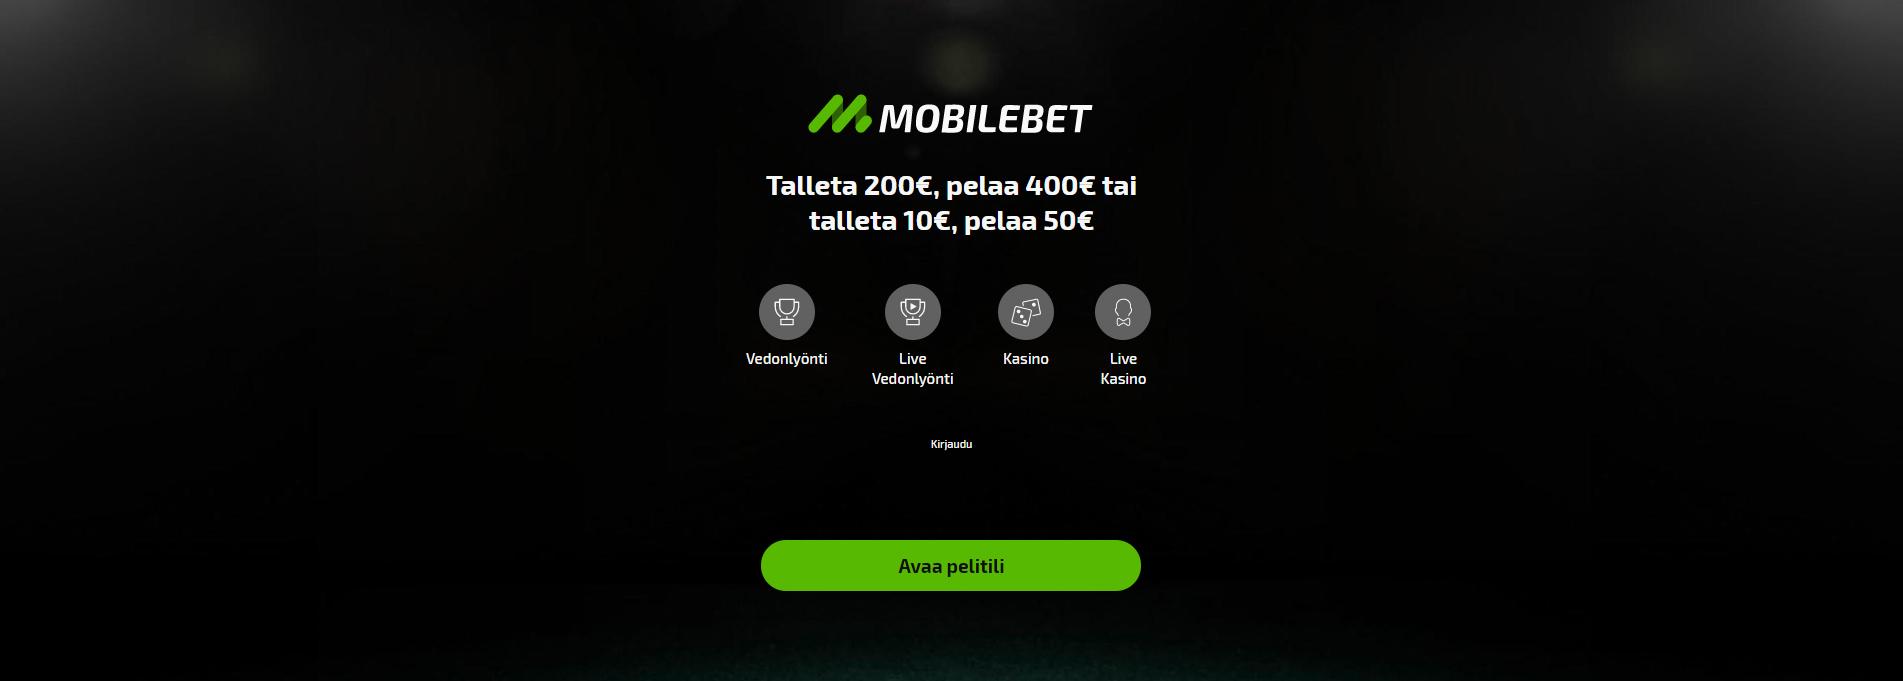 Mobilebet-Casino-Finland-Images1